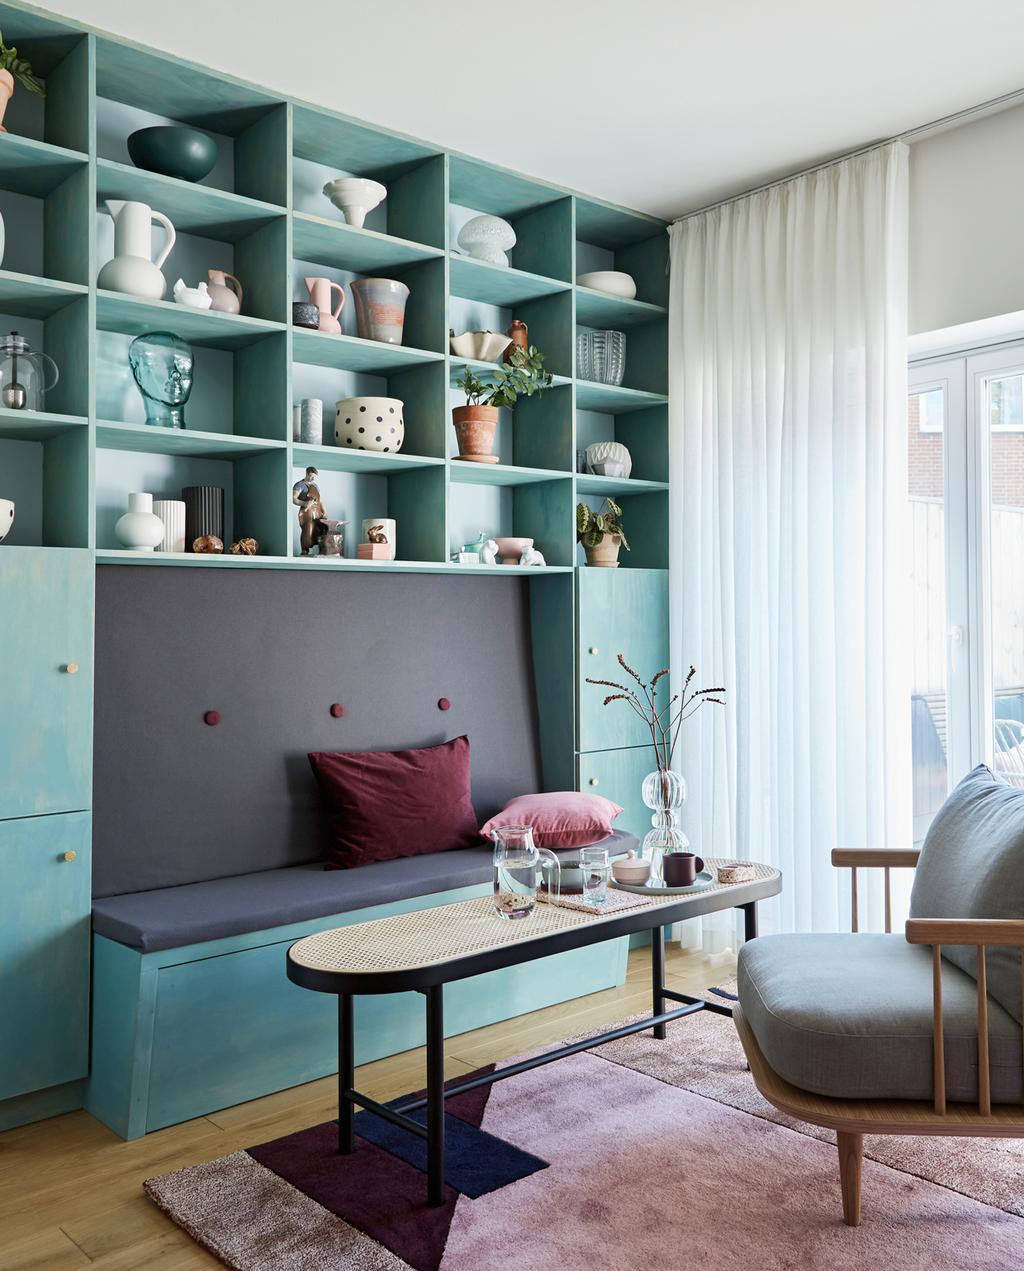 vtwonen 2-2020 | woonkamer met blauwe vakkenkast